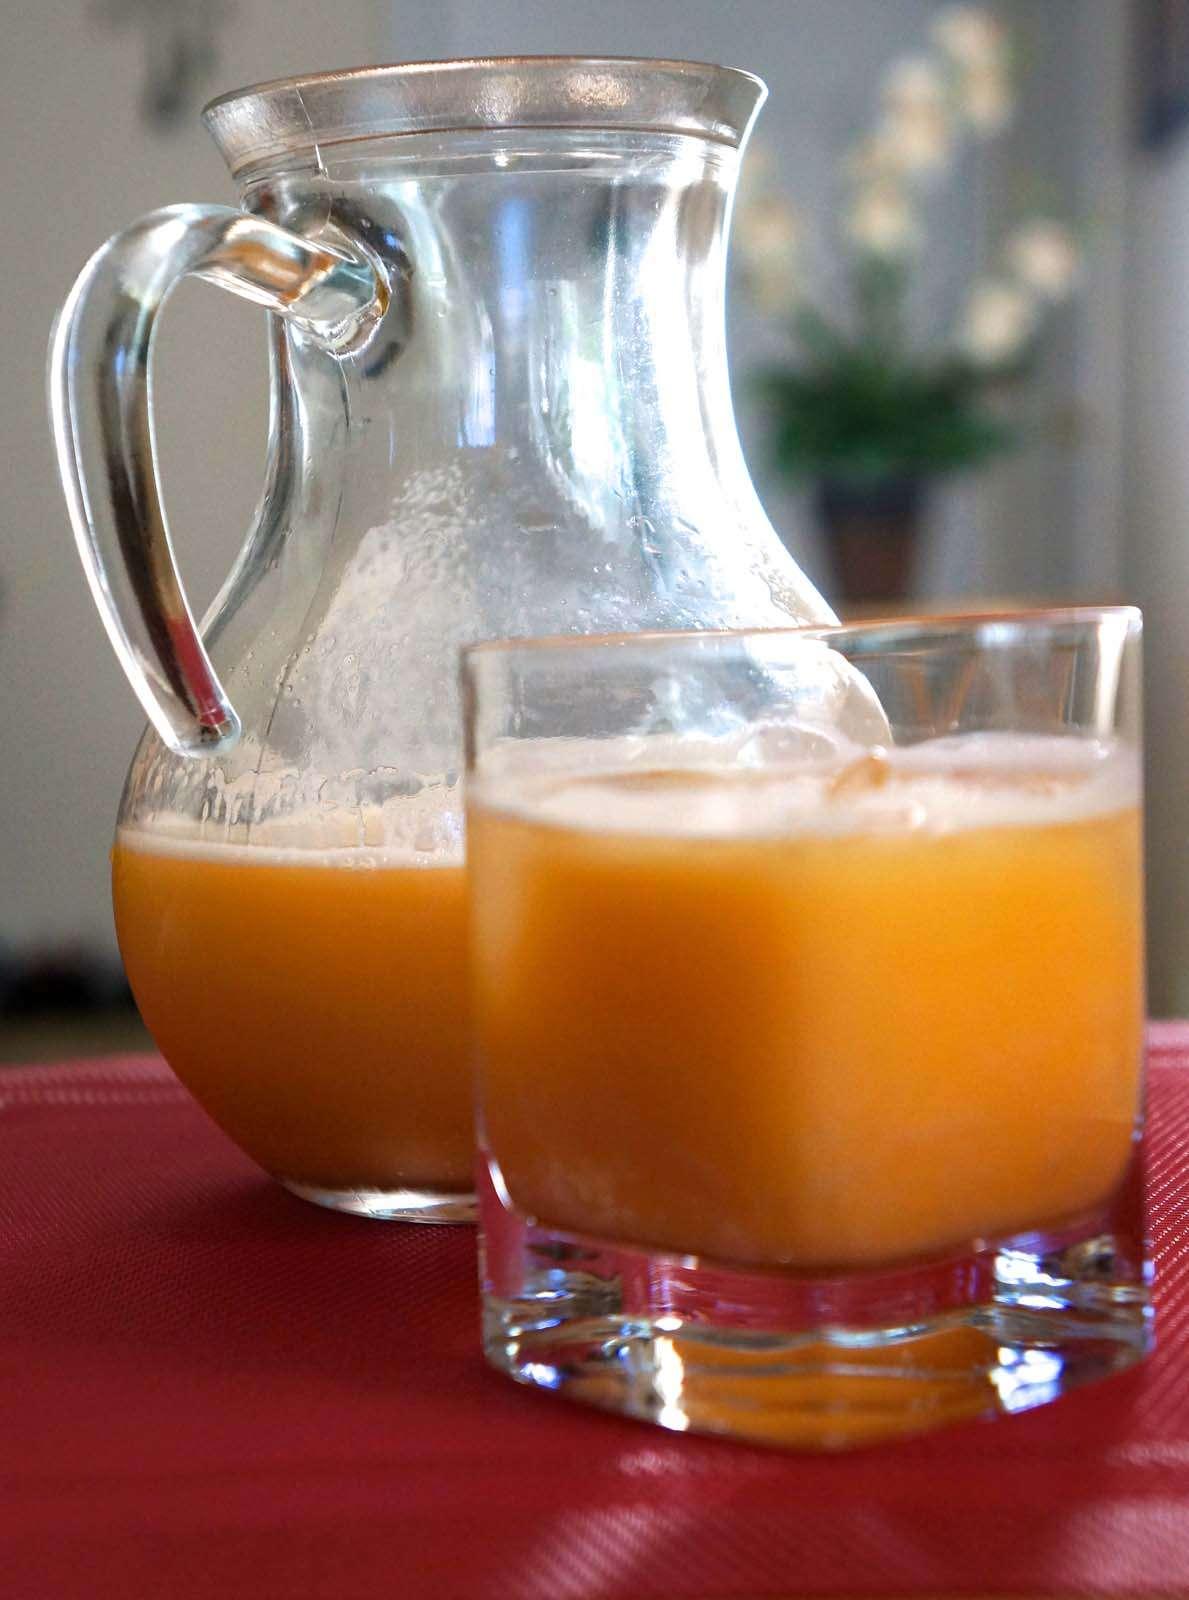 Milk with Haitian Cola